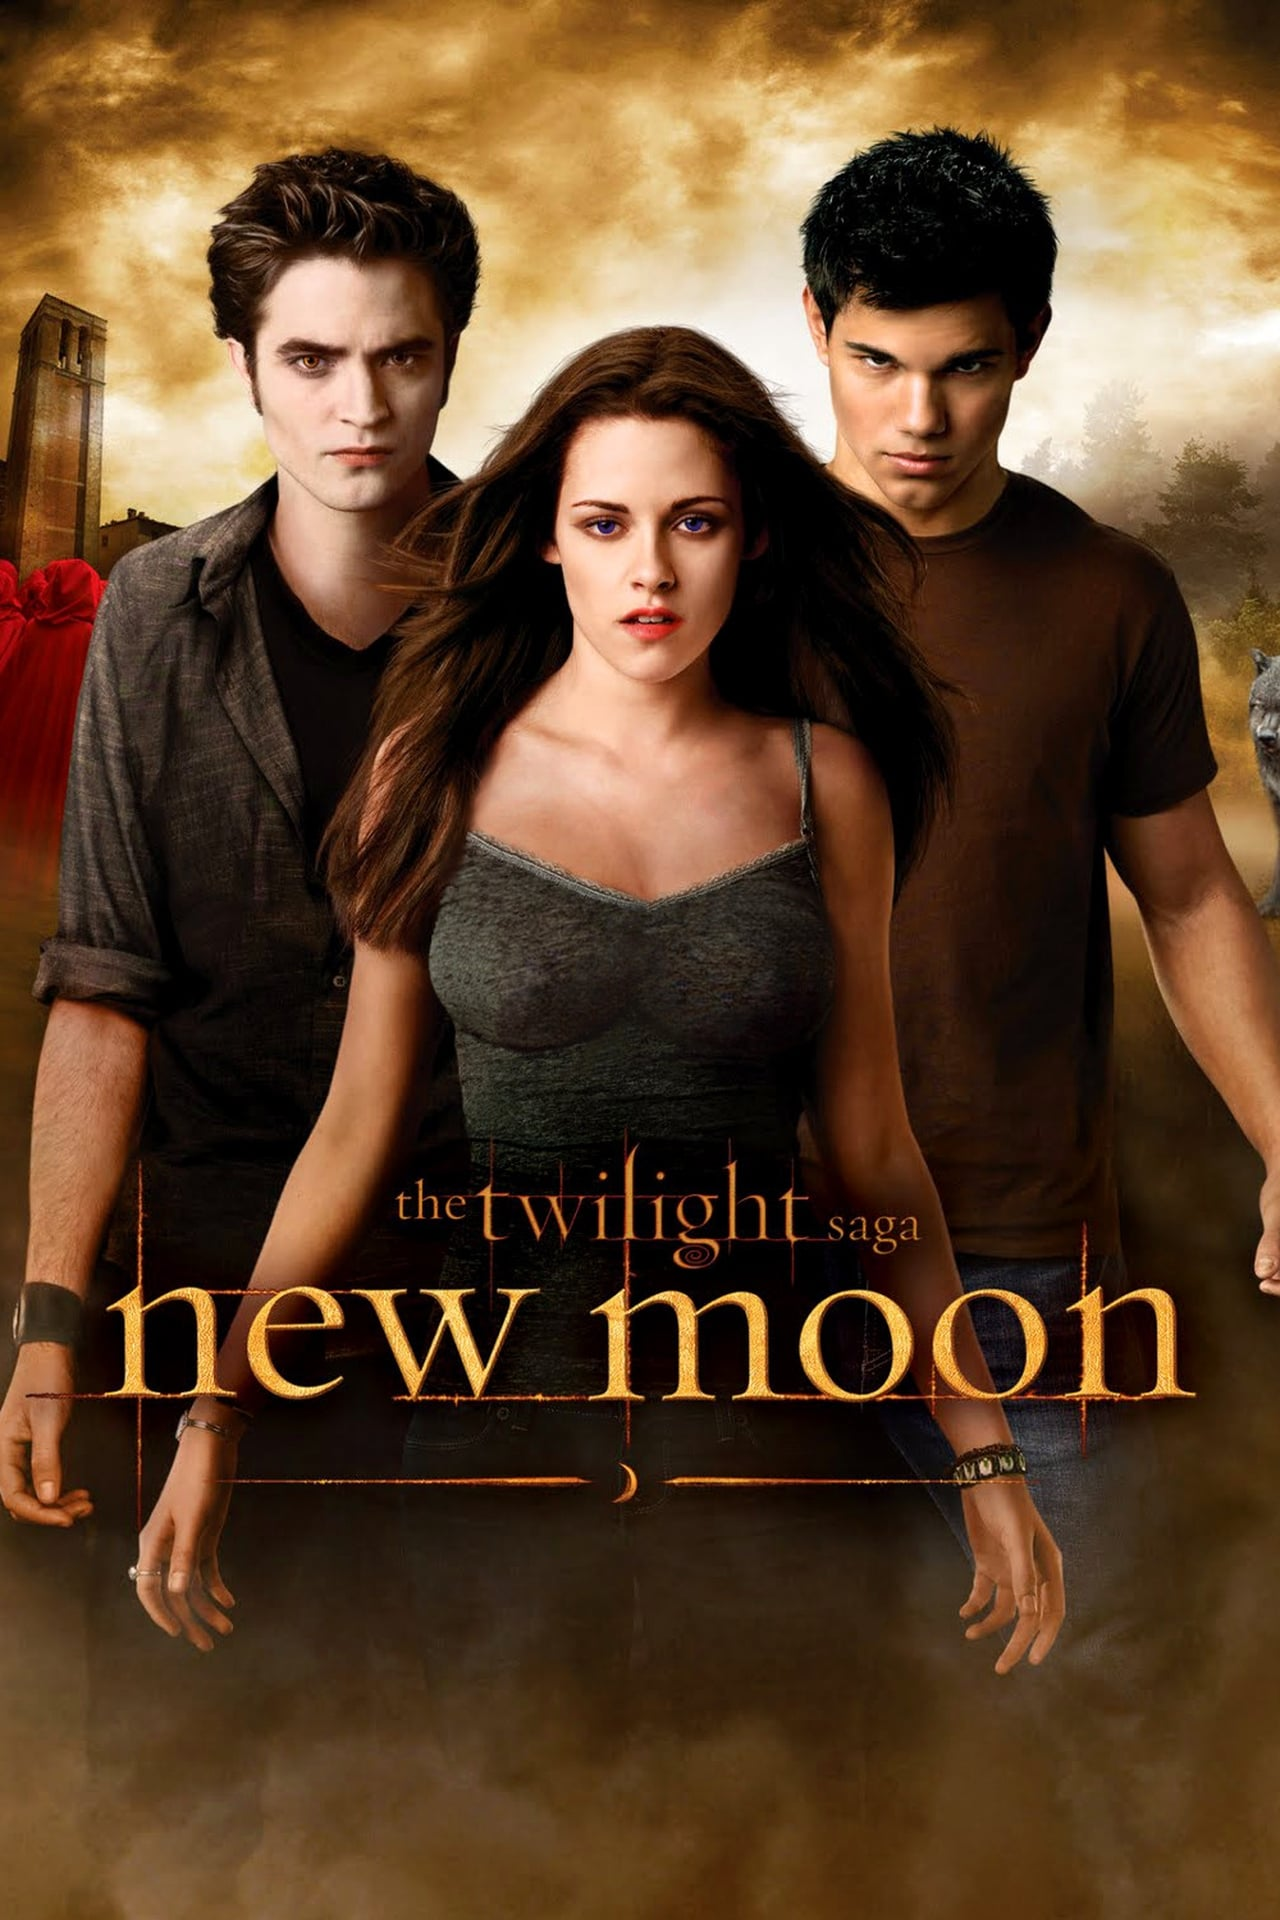 The Twilight Saga Breaking Dawn - Part 1 YIFY subtitles